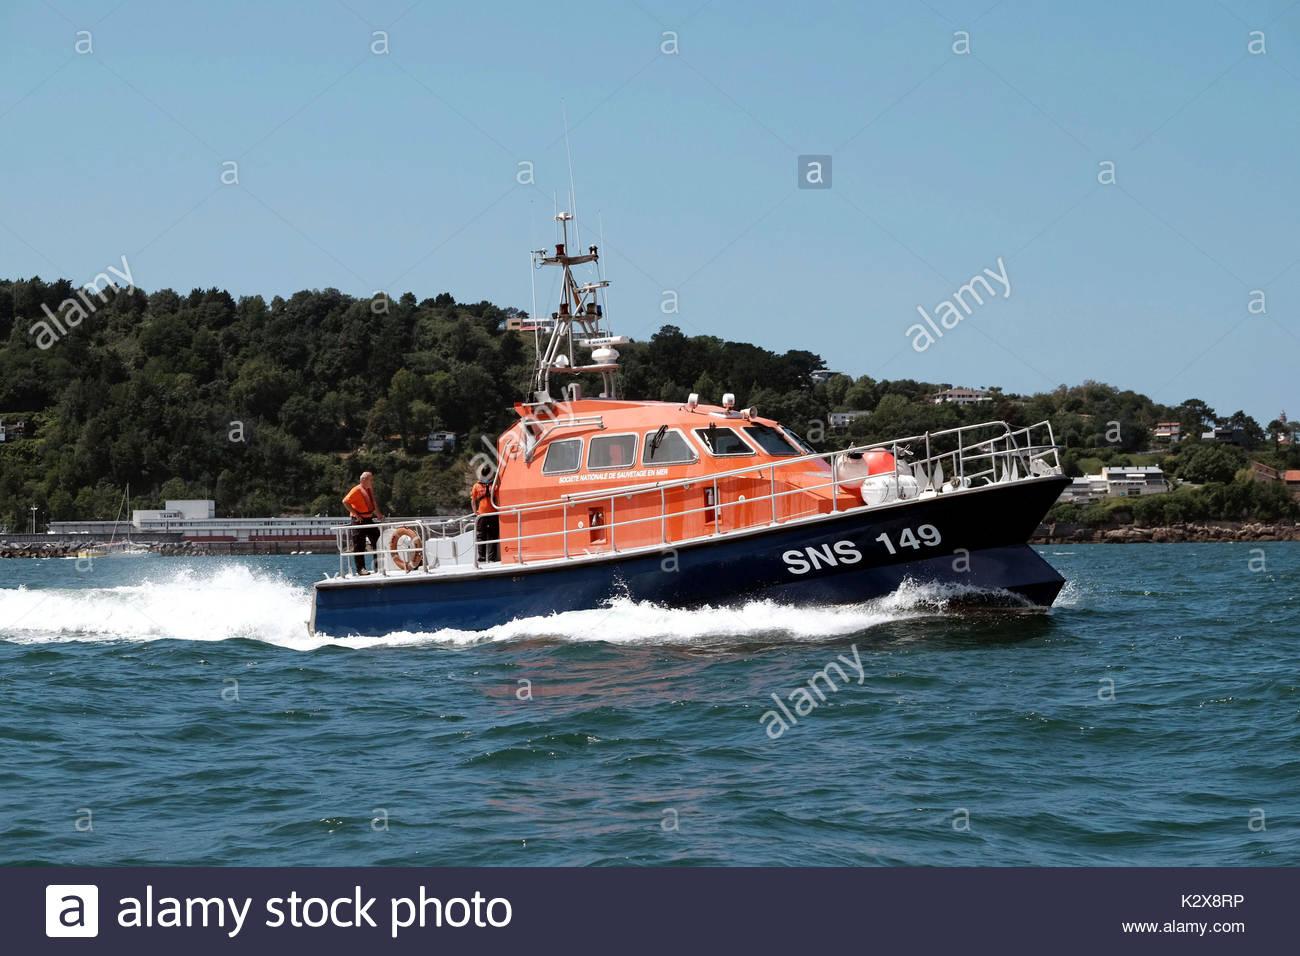 bateau de sauvetage de la snsm stock photos  u0026 bateau de sauvetage de la snsm stock images